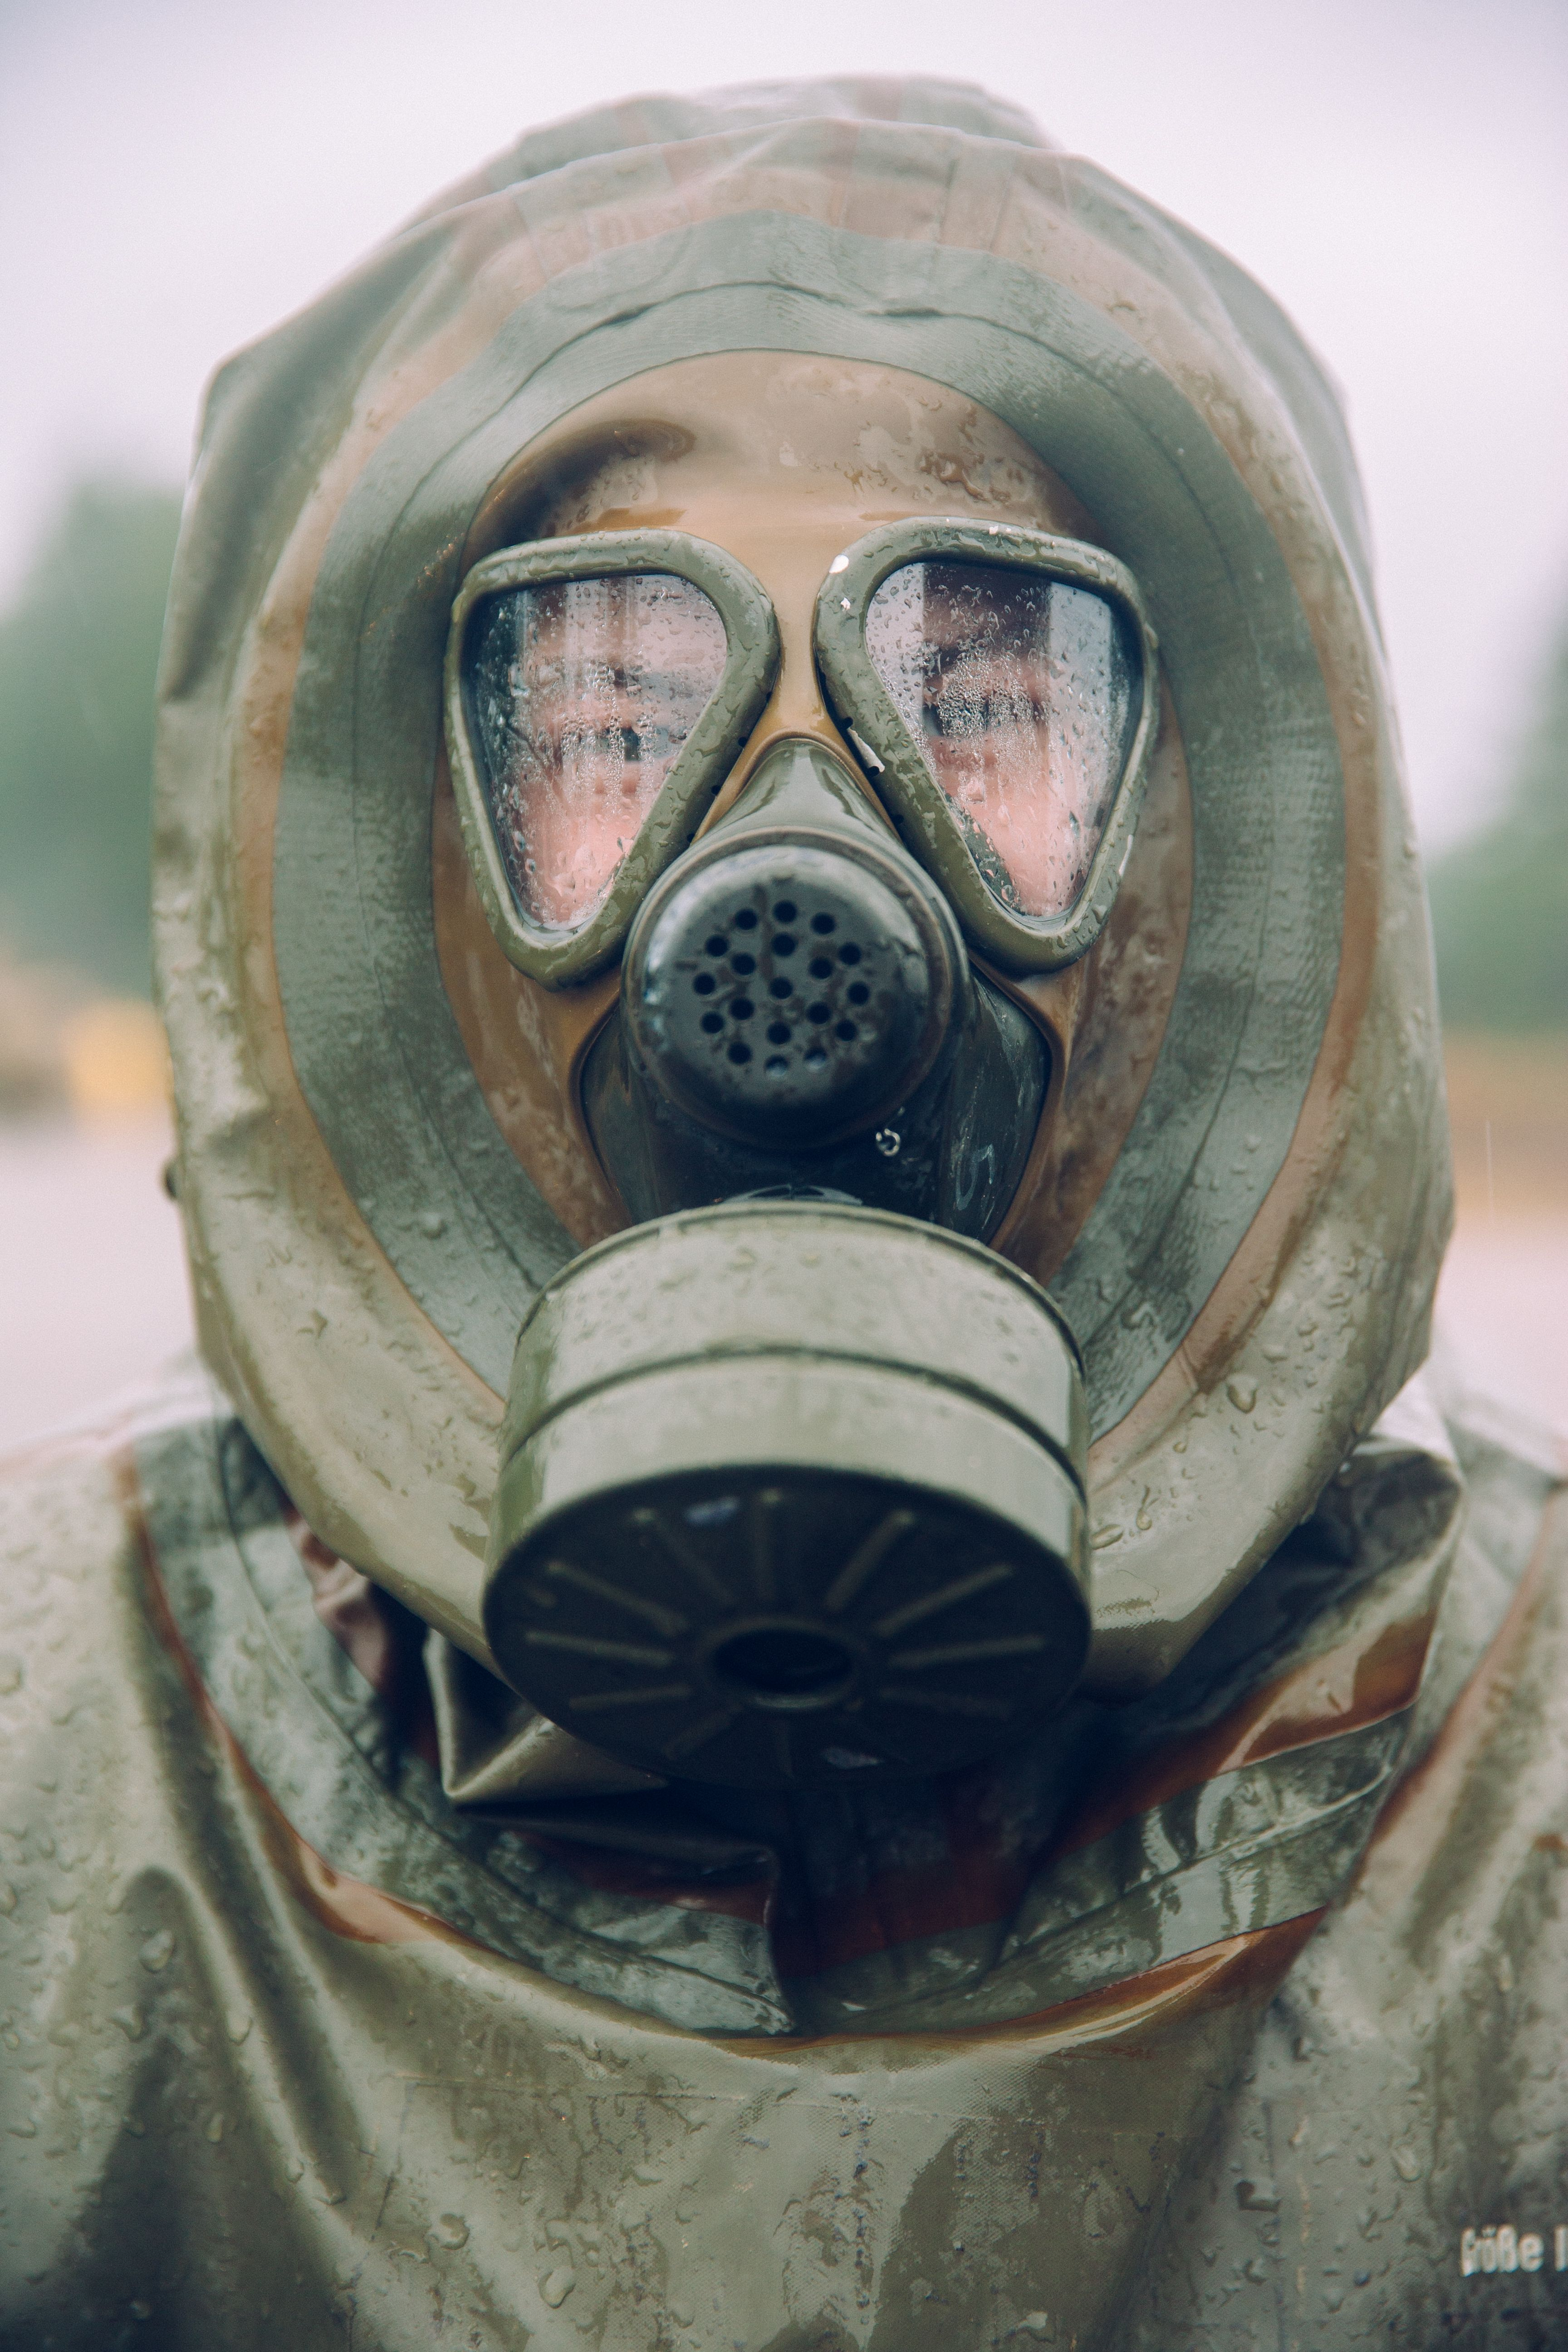 German Chemical Battalion soldier in Latvia wearing a hazmat suit